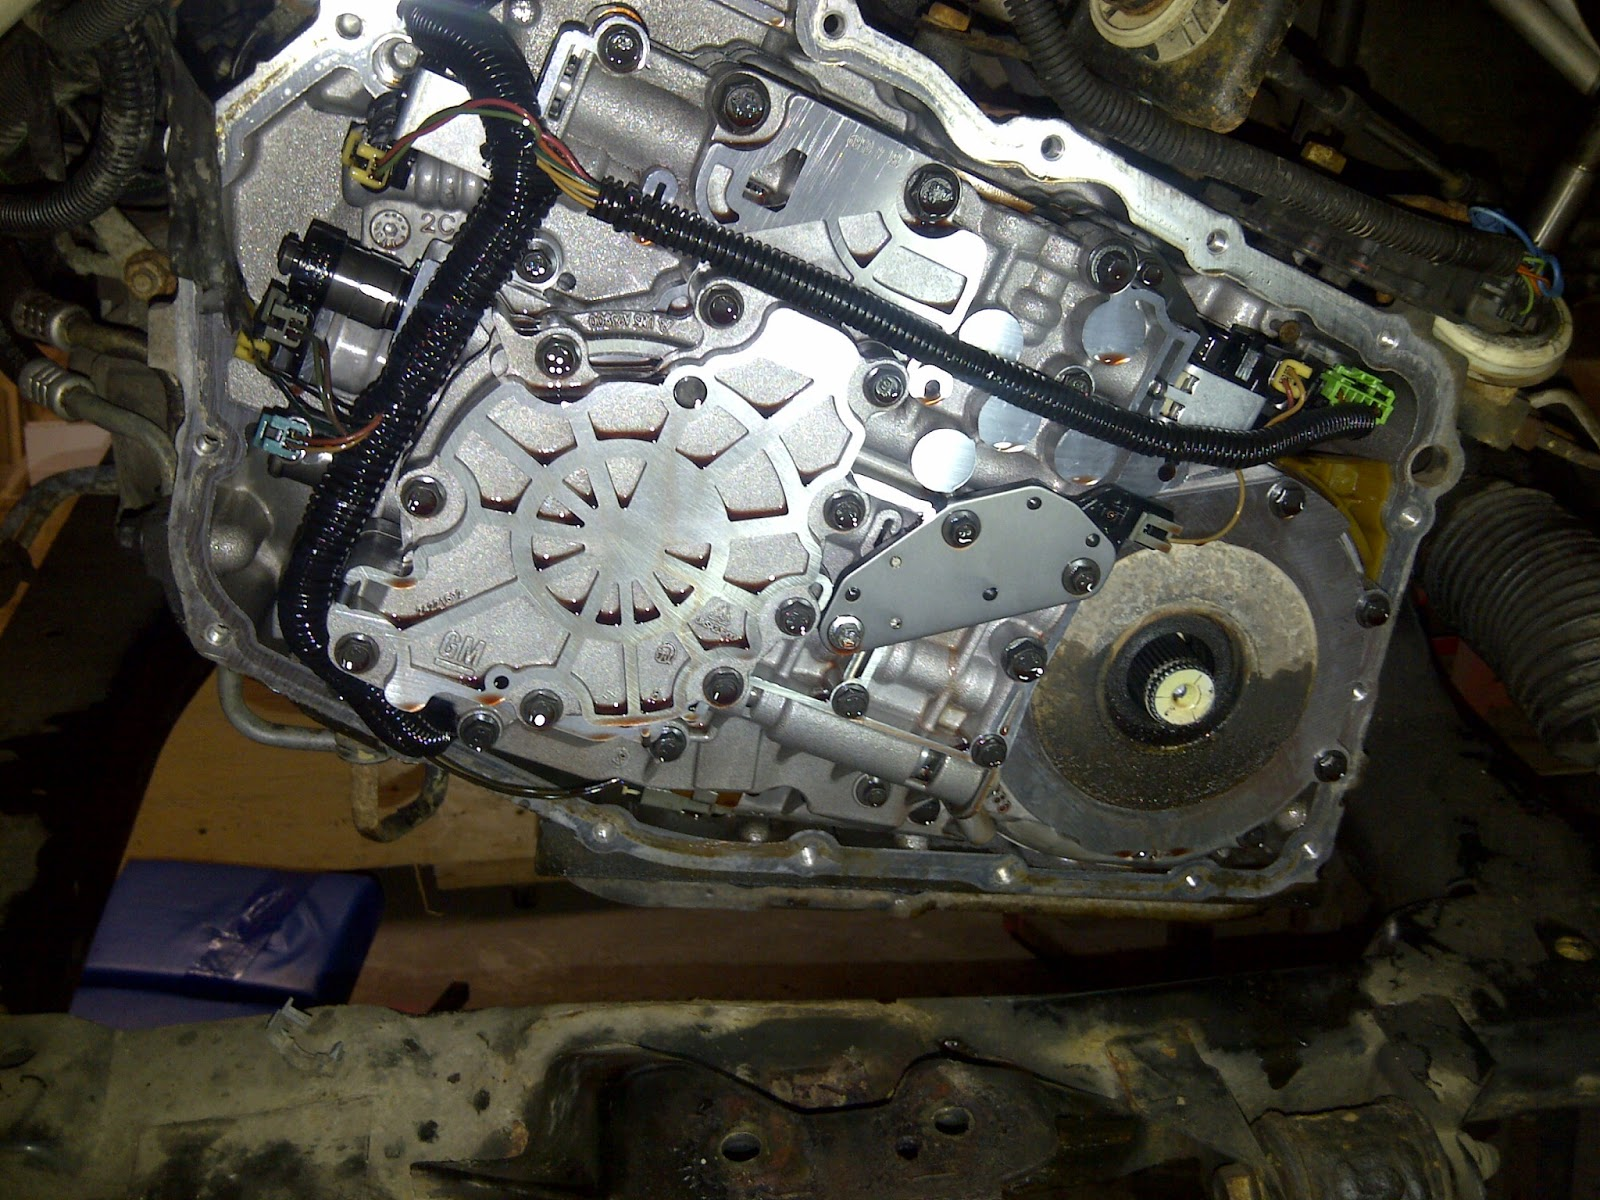 2001 Pontiac Montana Engine Diagram Wiring Diagrams For Sony Car Stereo Saturn Sl1 Transmission